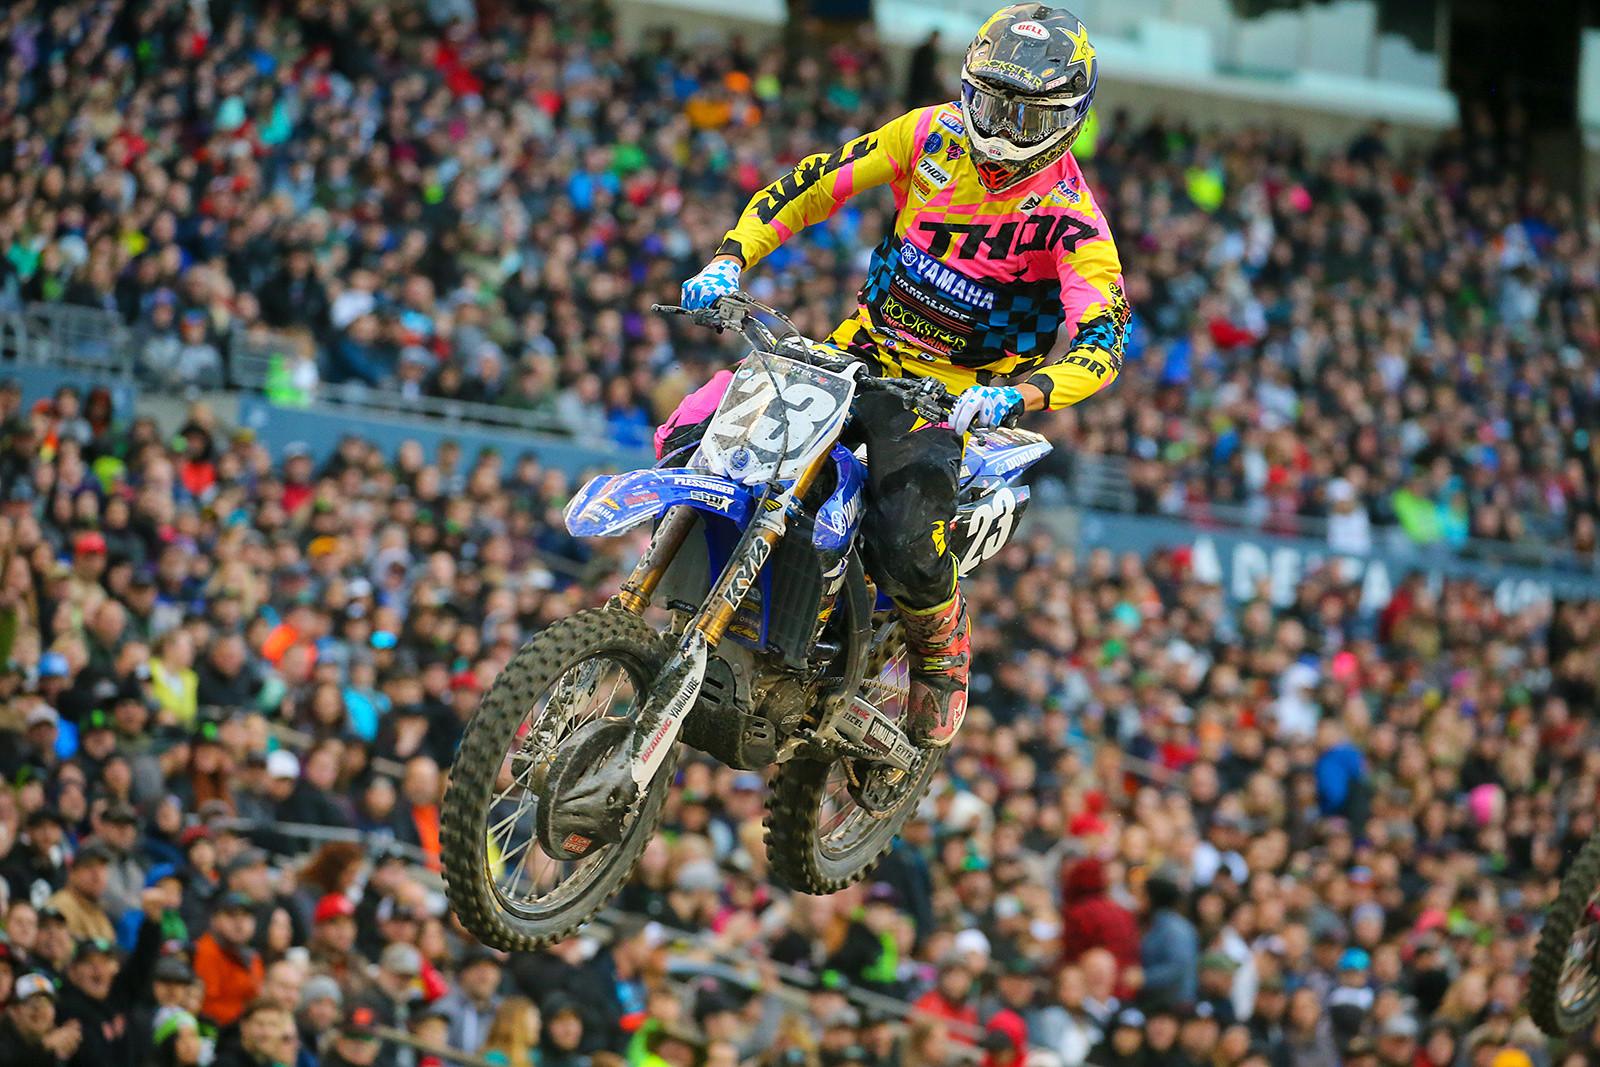 Aaron Plessinger - Photo Blast: Seattle - Motocross Pictures - Vital MX